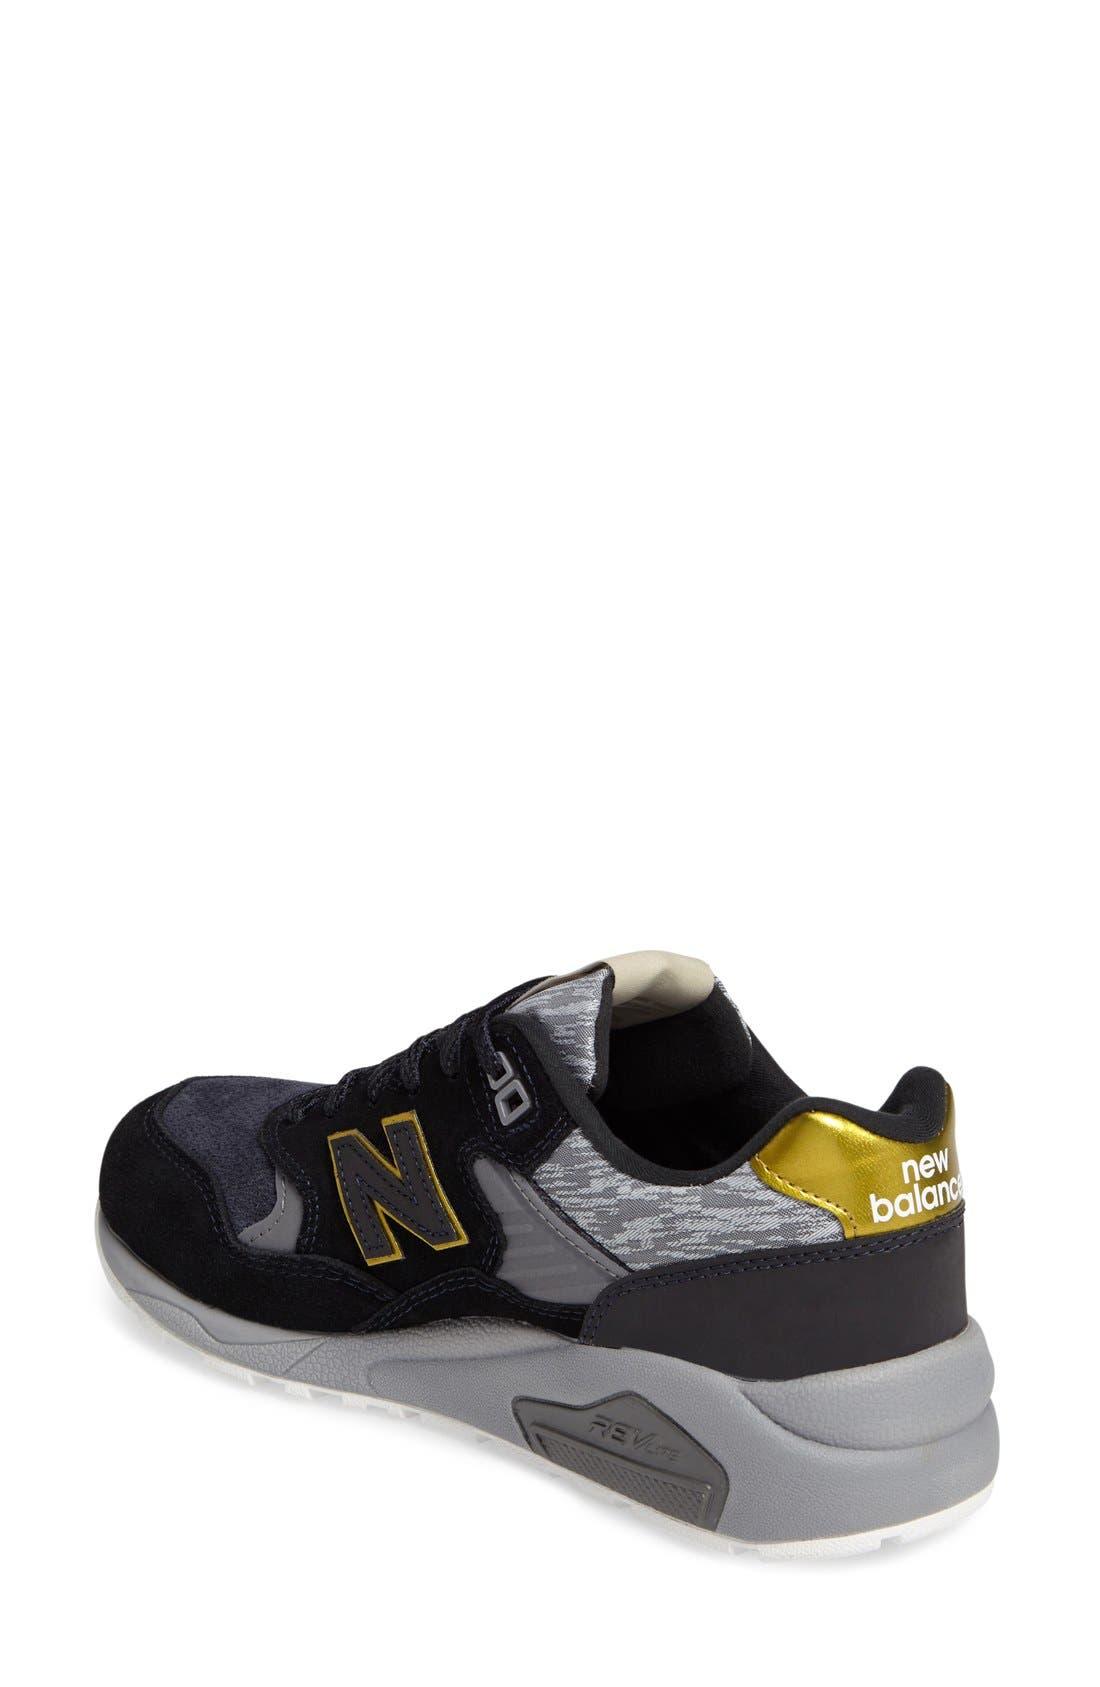 Alternate Image 2  - New Balance 580 Sneaker (Women)